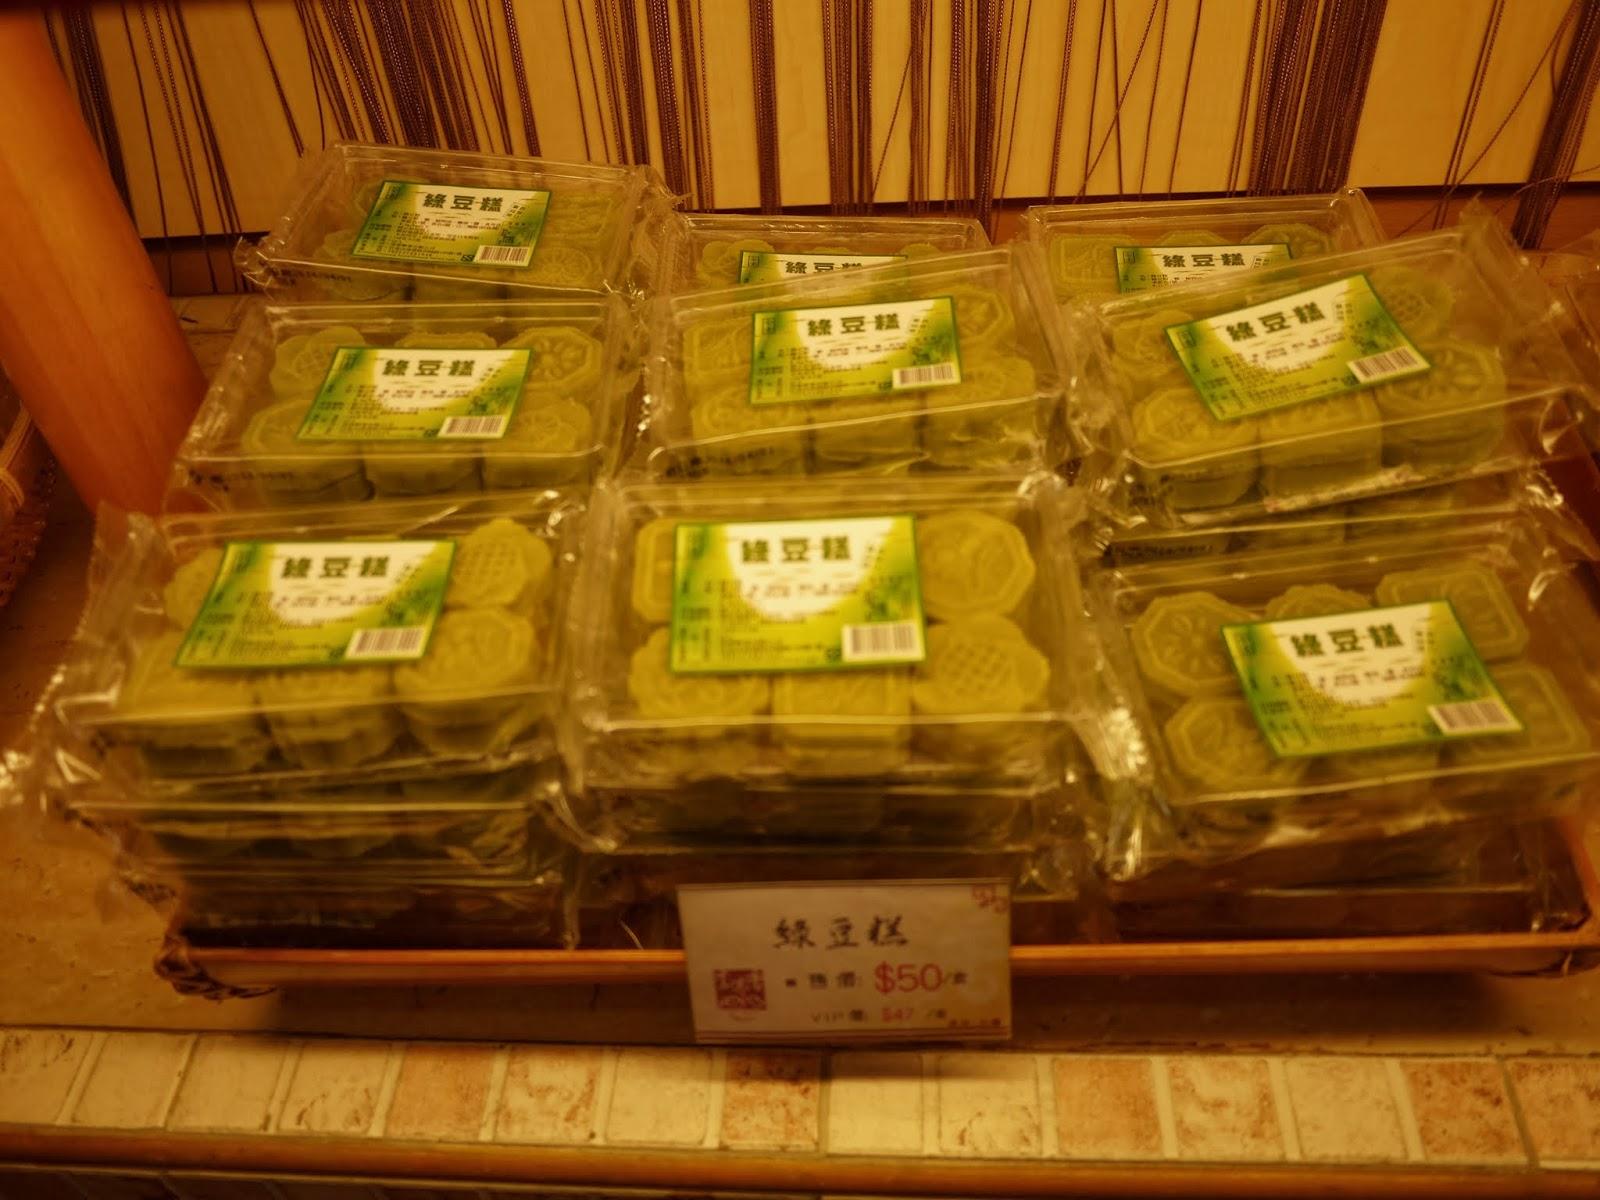 Cafe Afficionados ~: [臺北. 大稻埕] 牛粒身價水漲船高